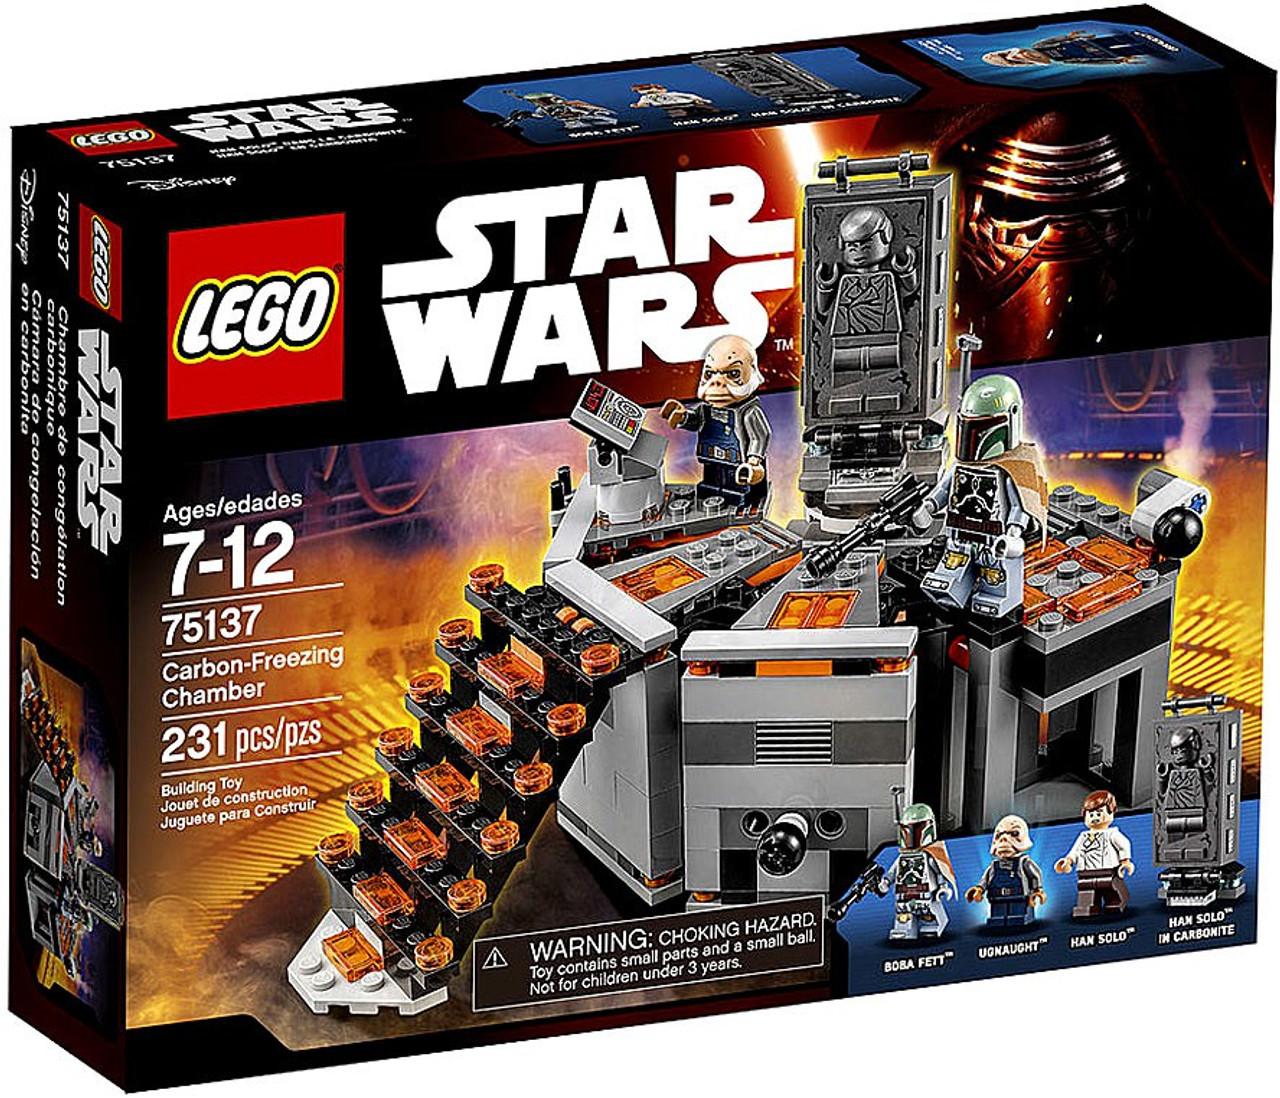 BULK star wars city town etc. 50 NEW LEGO 2x2 Black Bricks ID 3003//300326